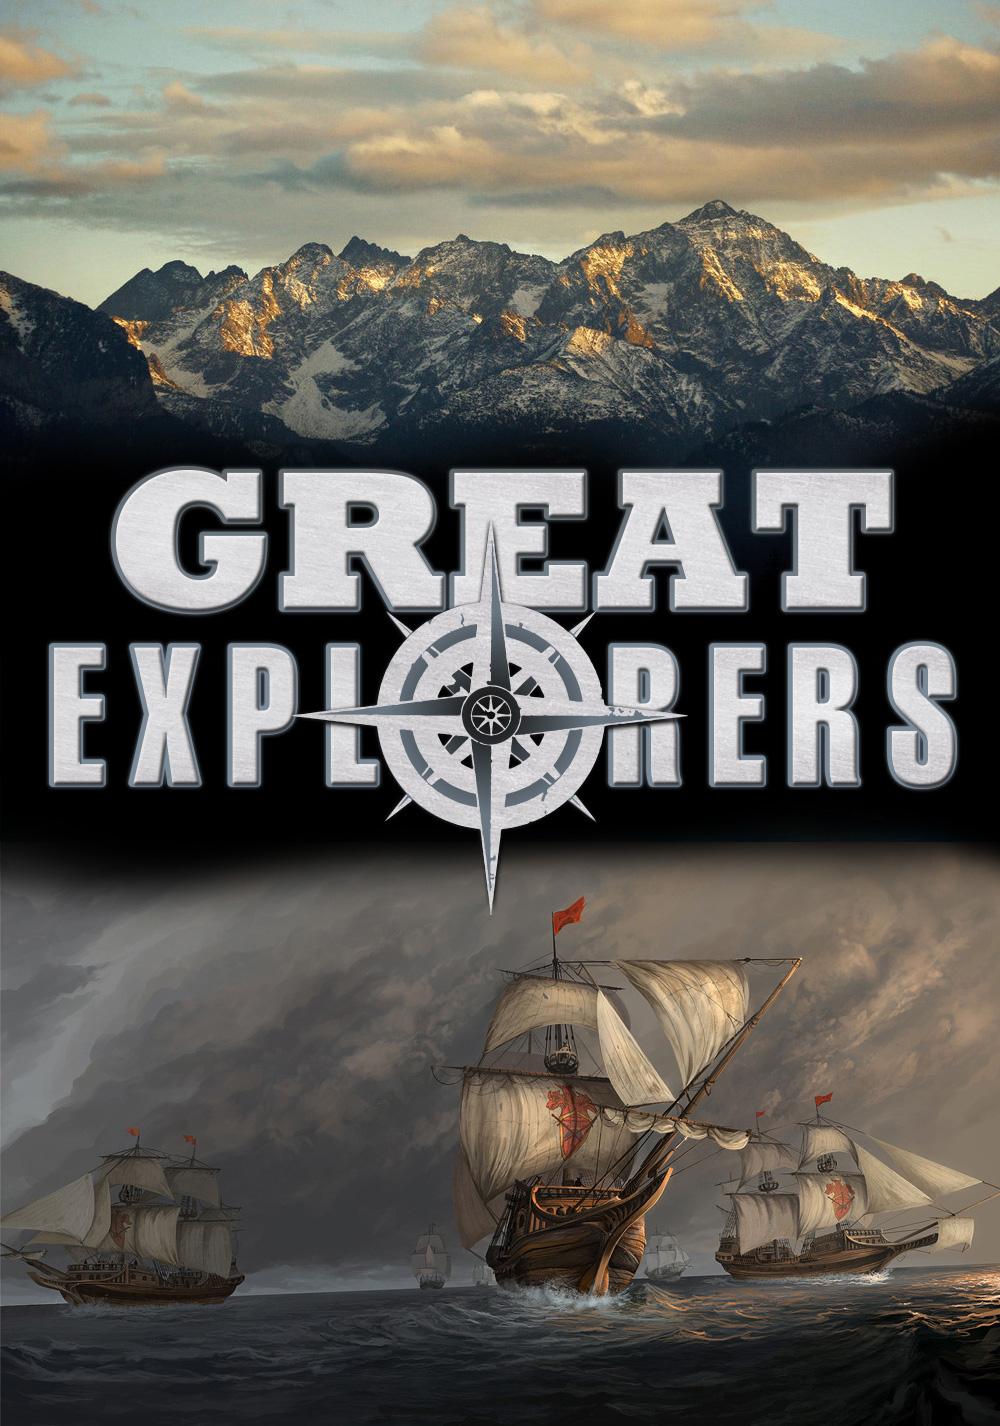 Great Explorers: Pacific